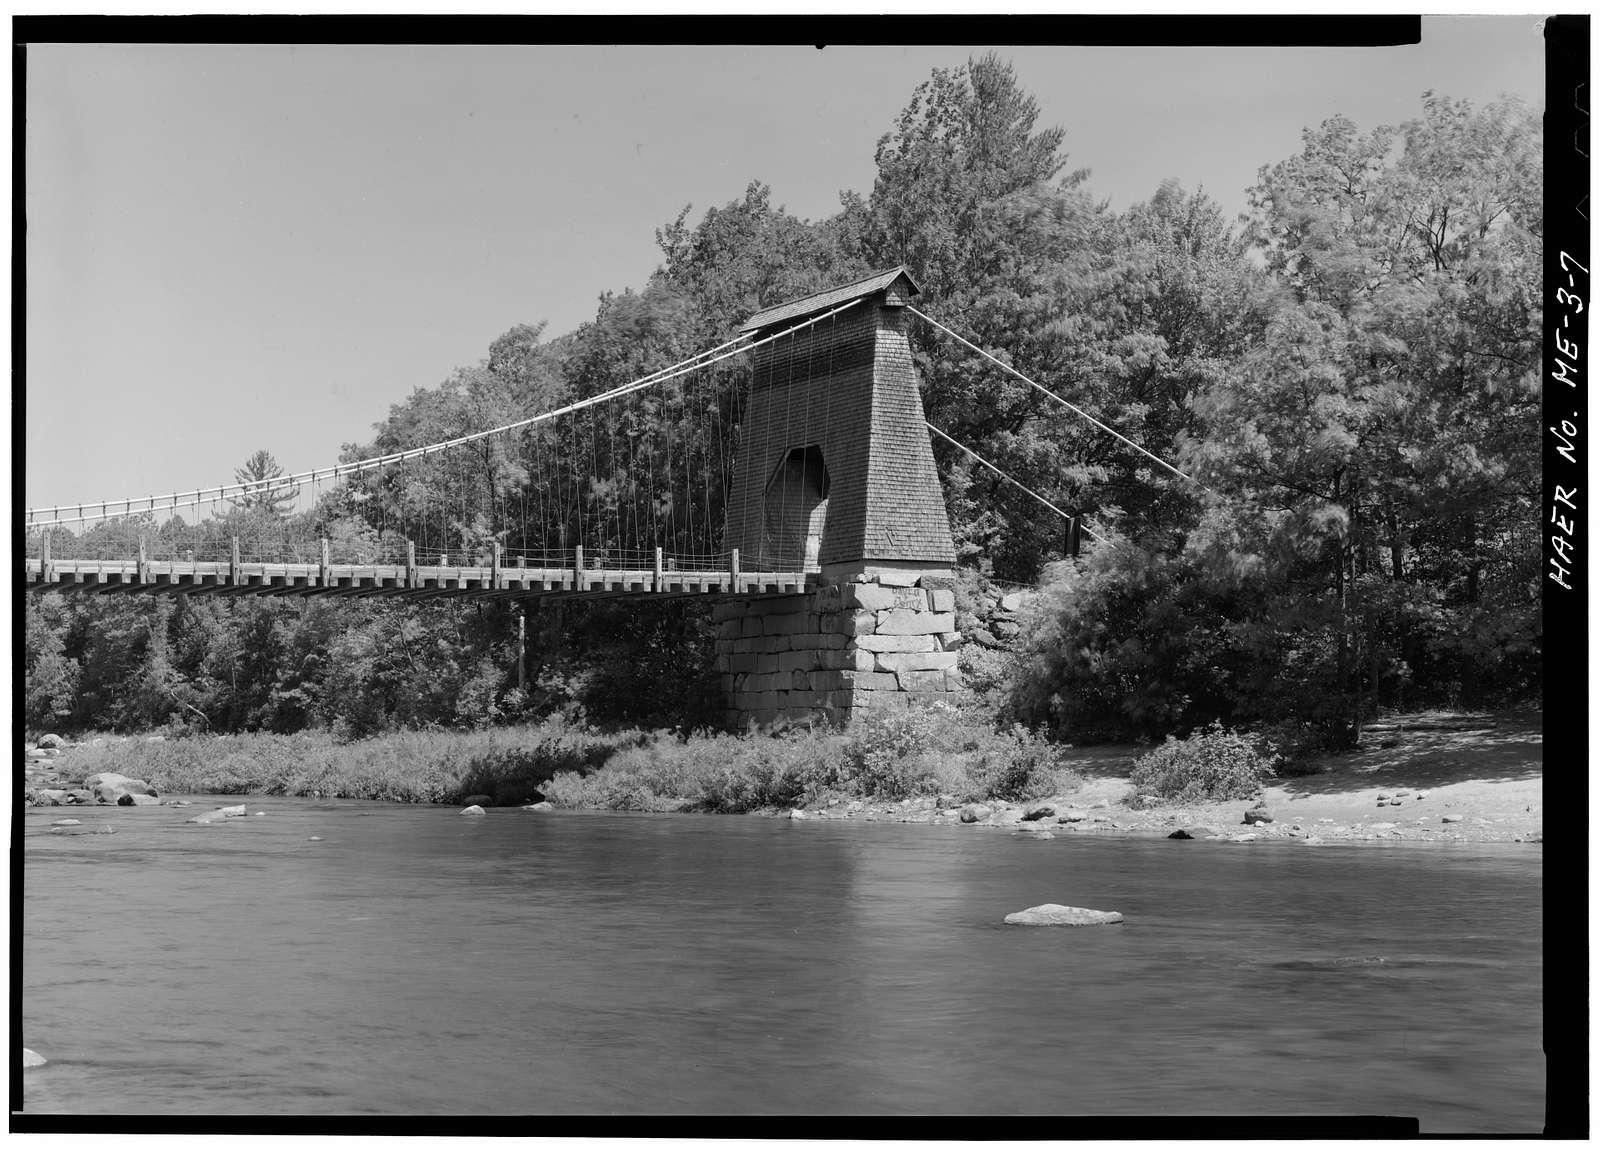 New Portland Suspension Bridge, Spanning Carrabasset River, New Portland, Somerset County, ME